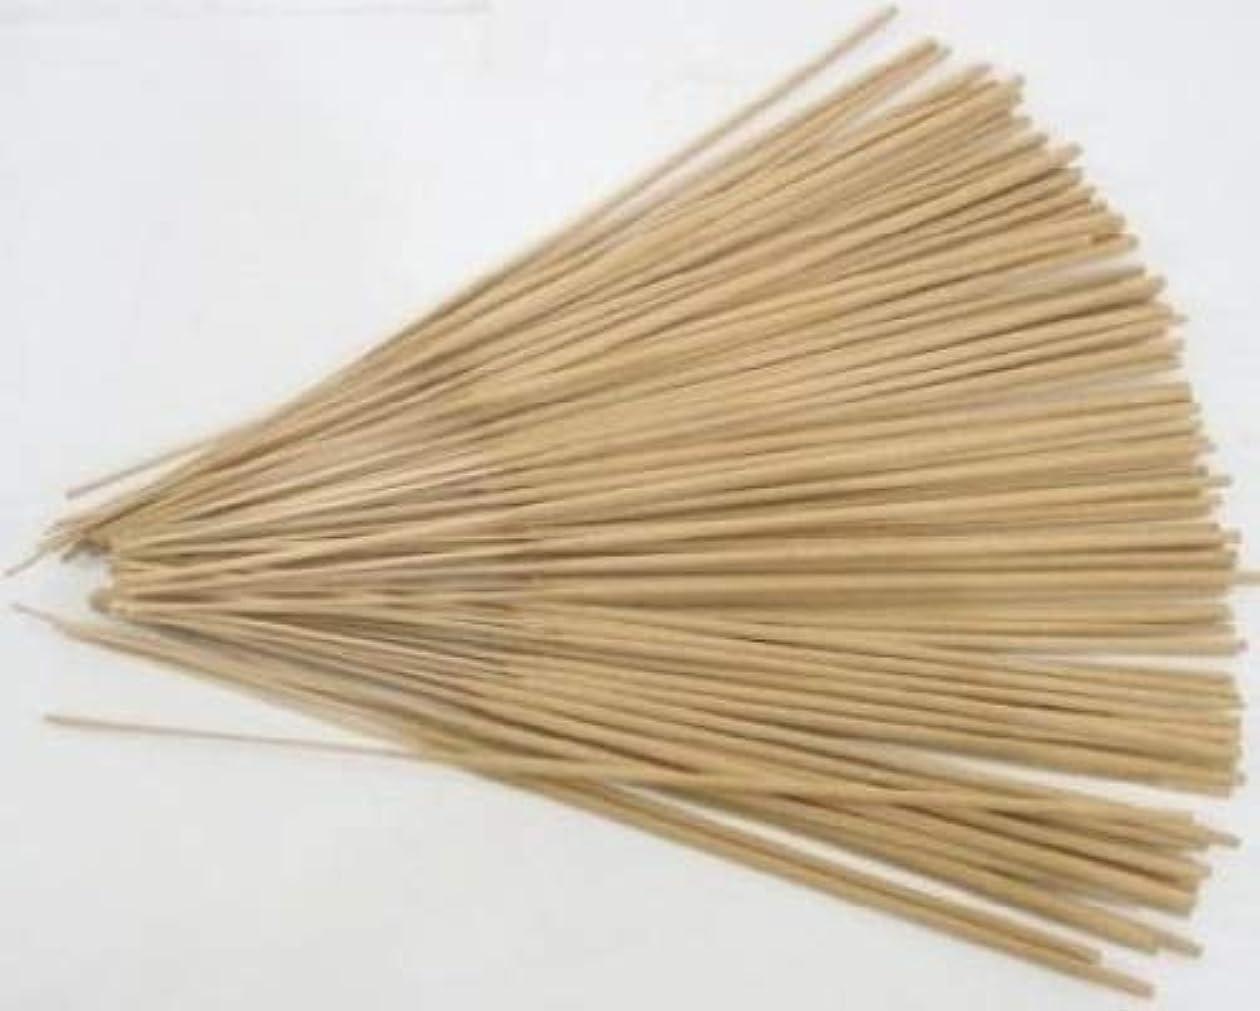 哲学的令状抹消Unscented Incense Sticks, 1000 pack